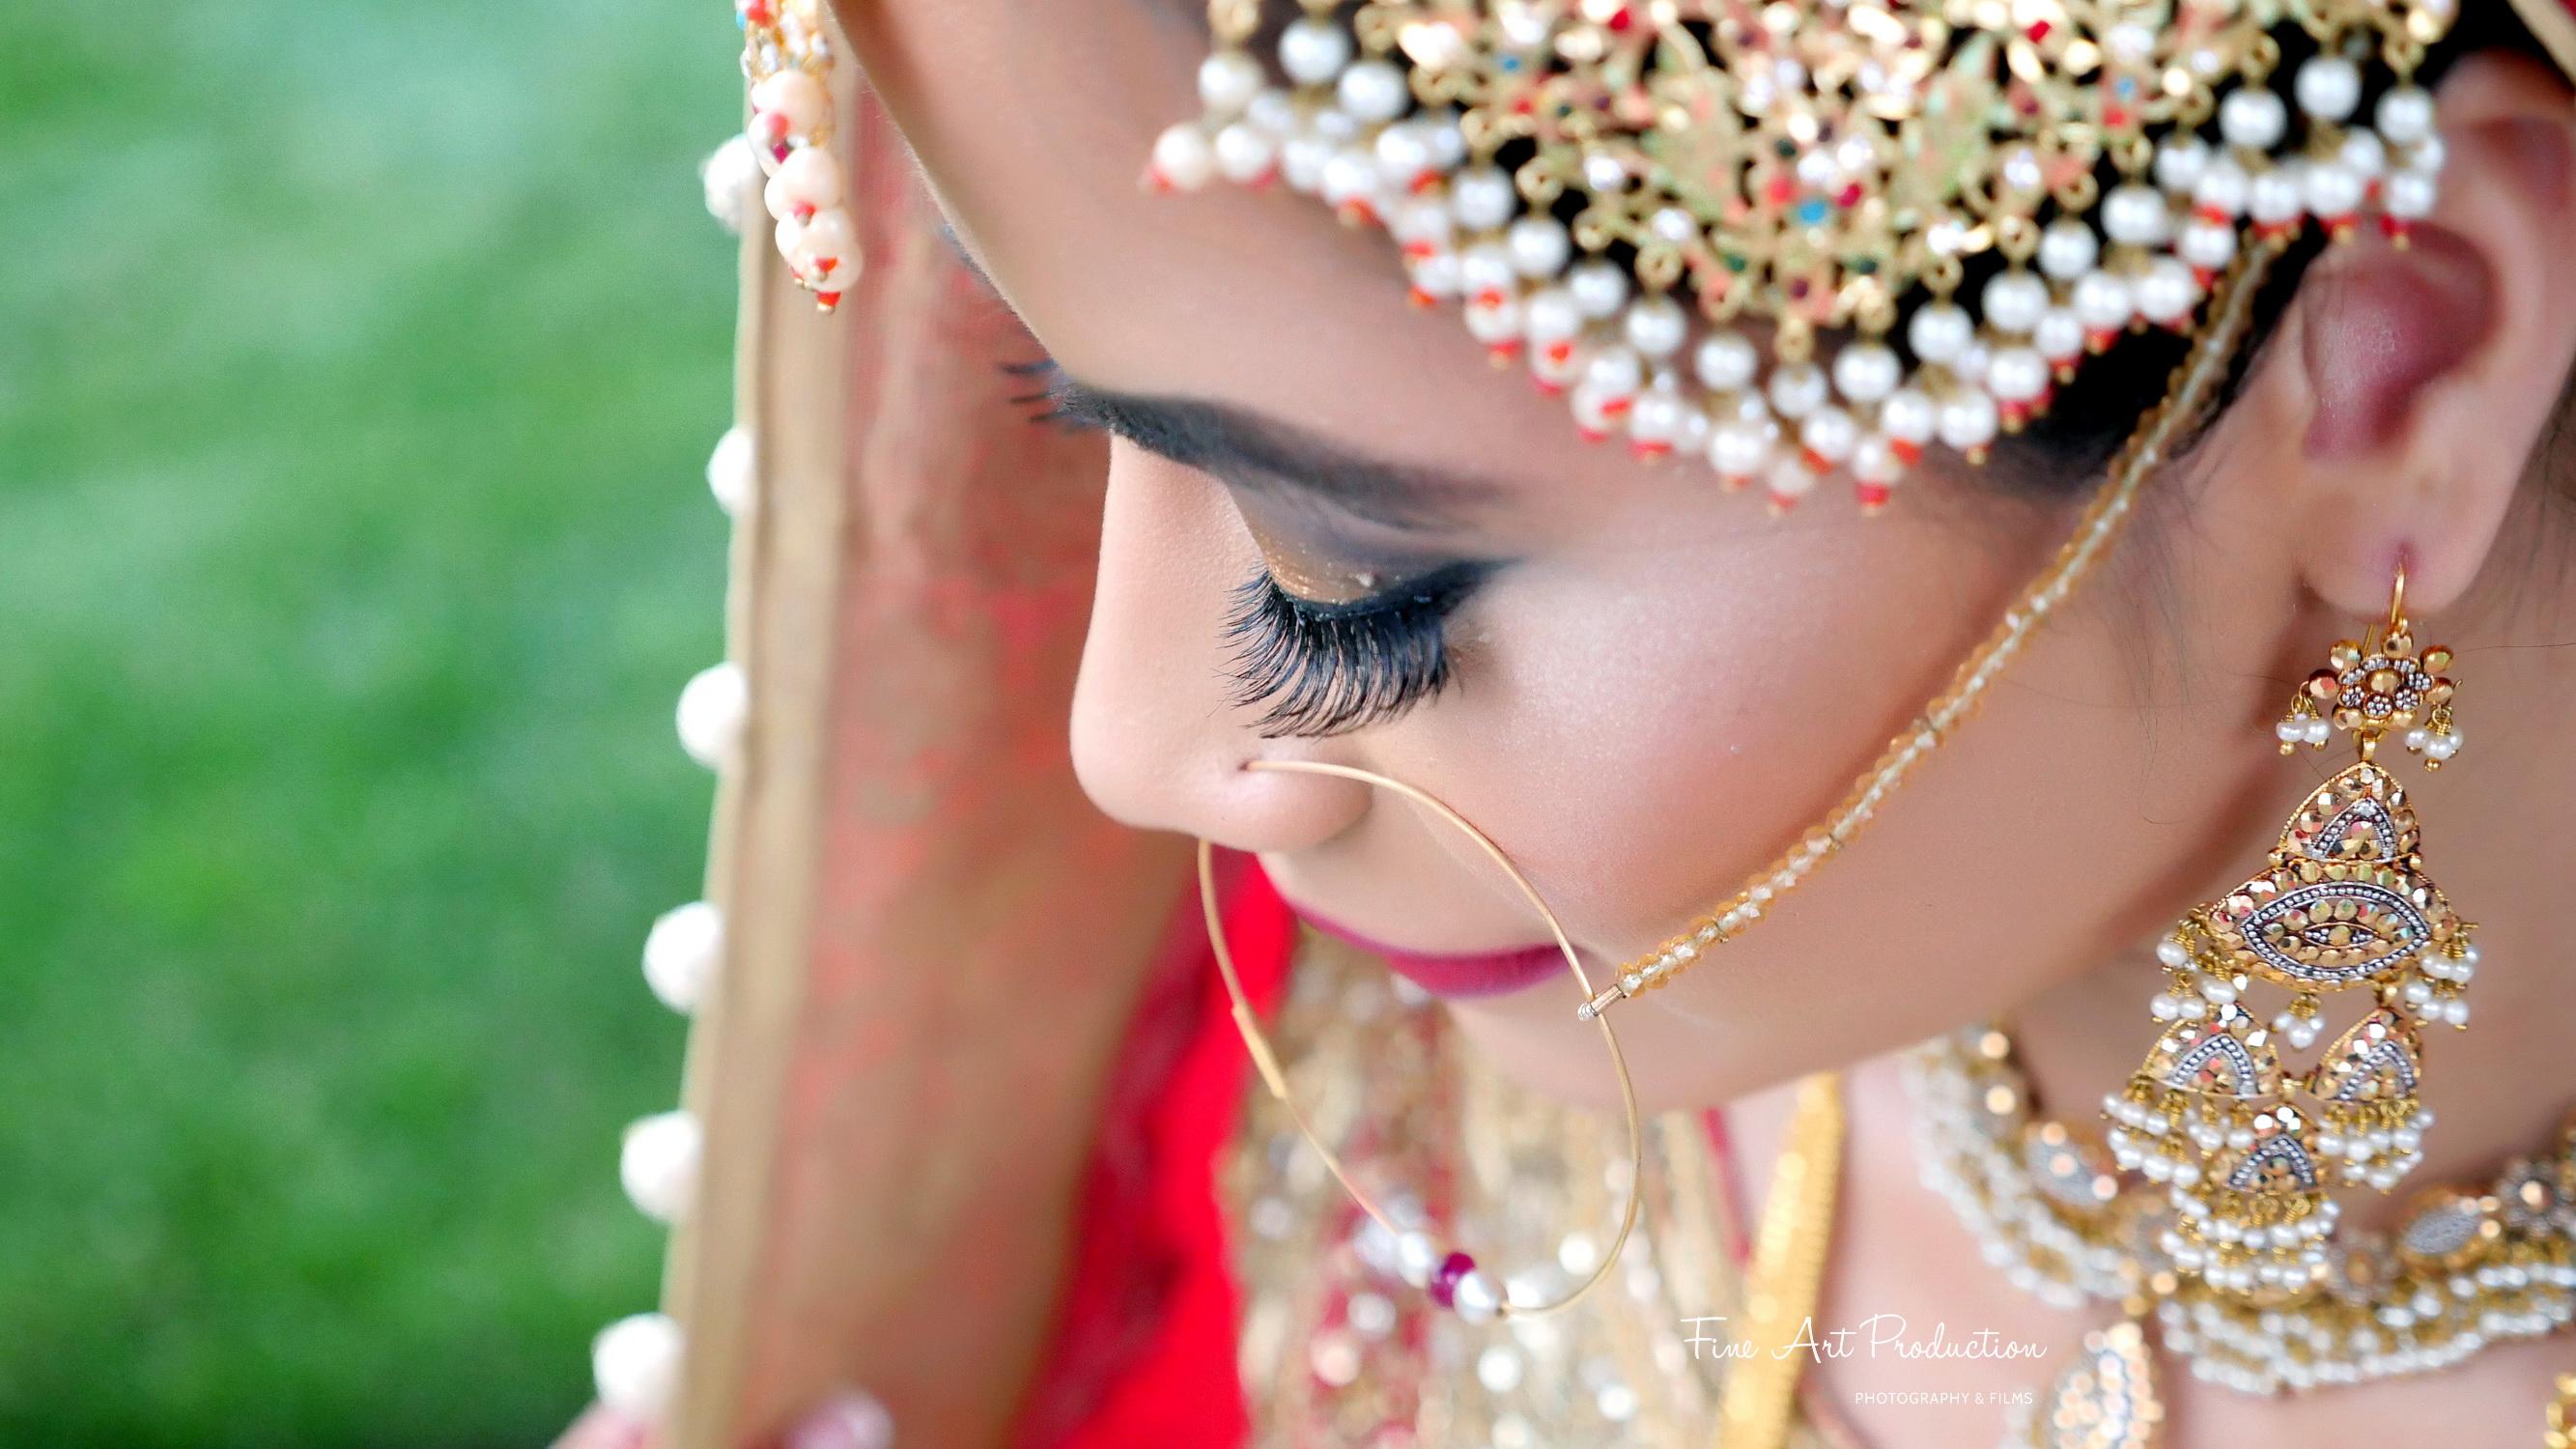 india-wedding-photographer-fine-art-production-chirali-amish-thakkar_0074